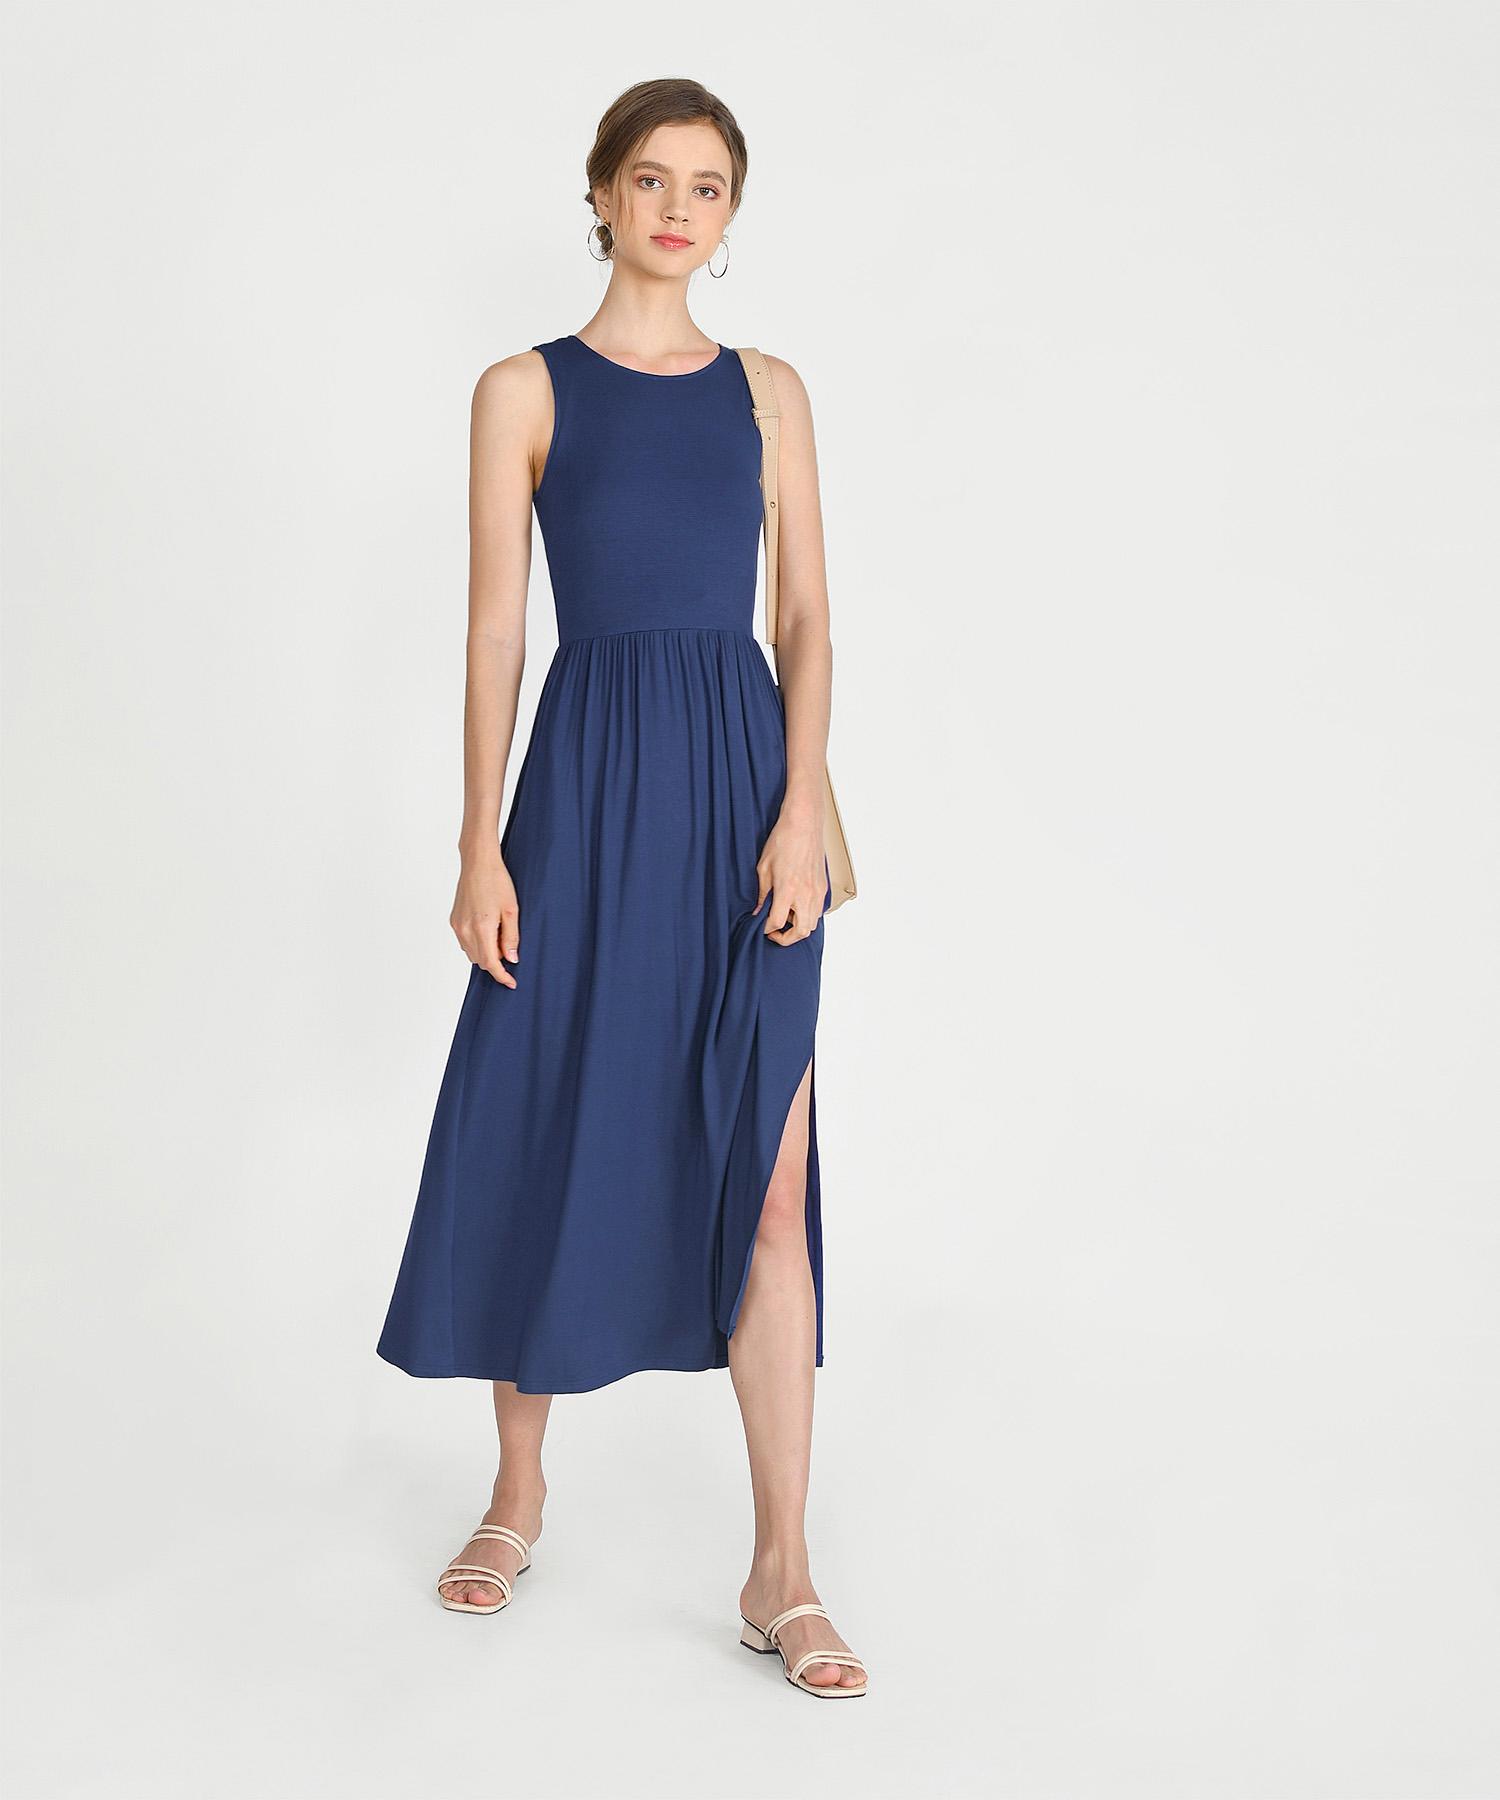 winnie-cotton-maxi-dress-navy-1